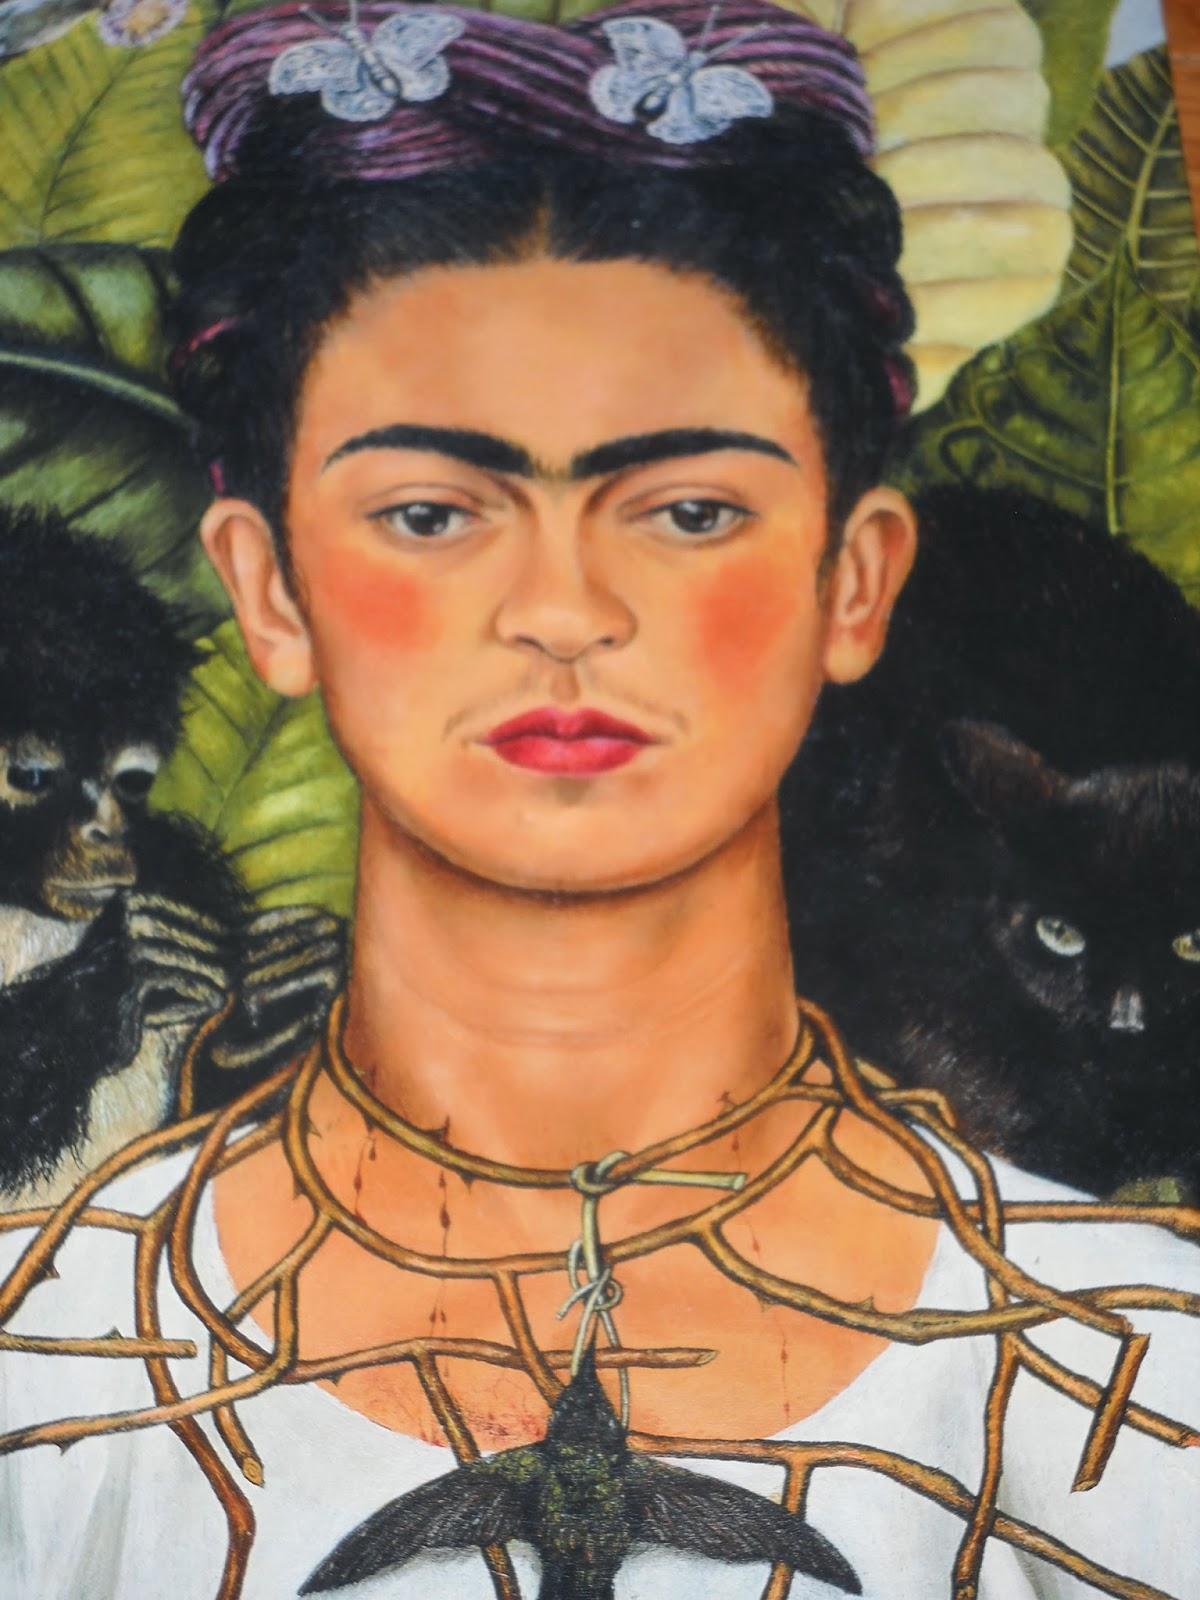 frida kahlo biography Magdalena carmen frida kahlo y calder n (6 july 1907 - 13 july 1954), jiske jaada kar ke frida kahloke naam se jaana jaawat rahaa, ek mexican painter rahaa.